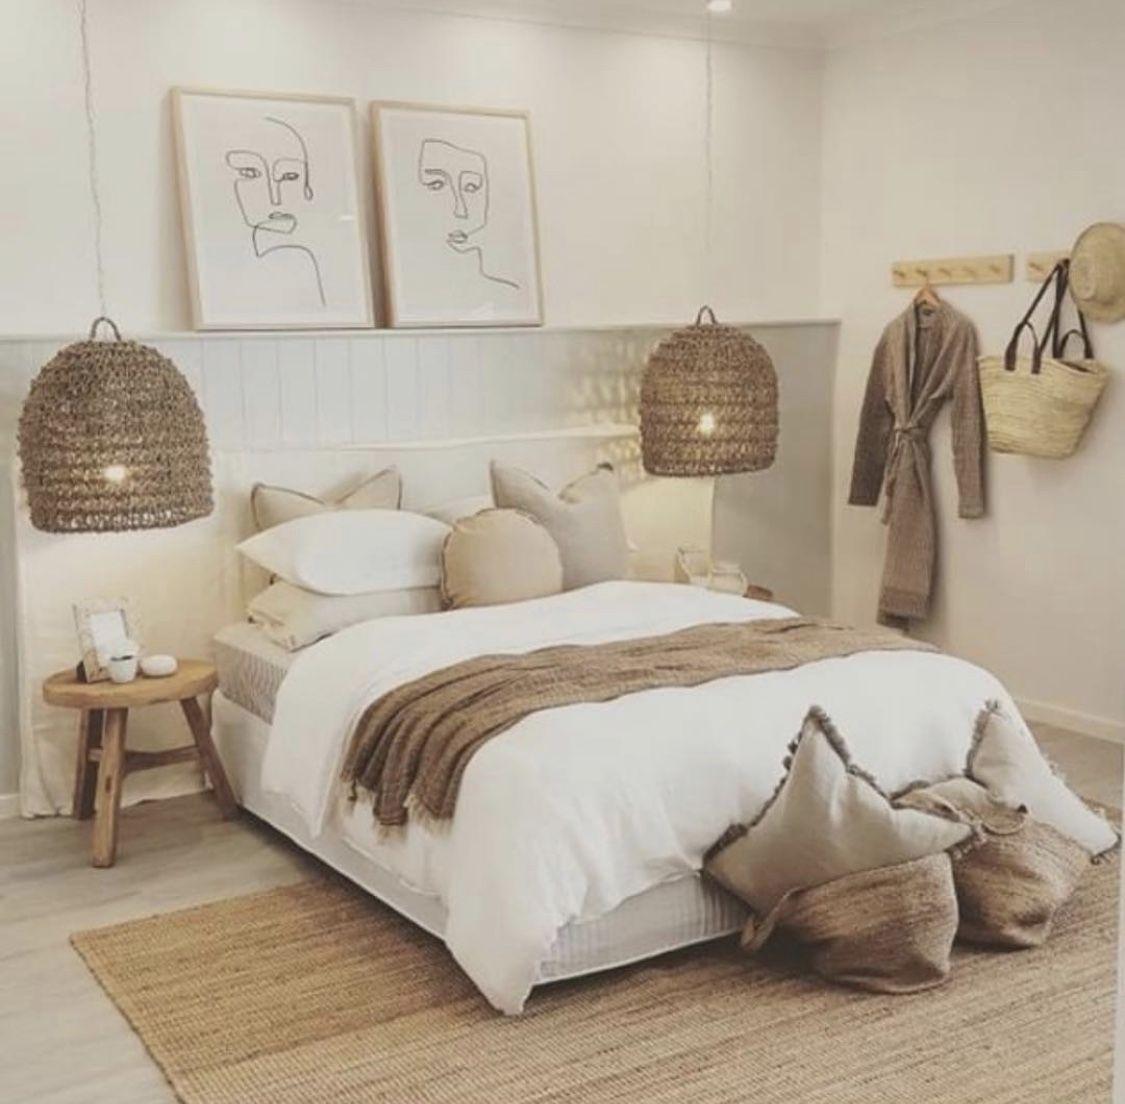 Boho bedroom en 15  Decoration chambre blanche, Déco chambre